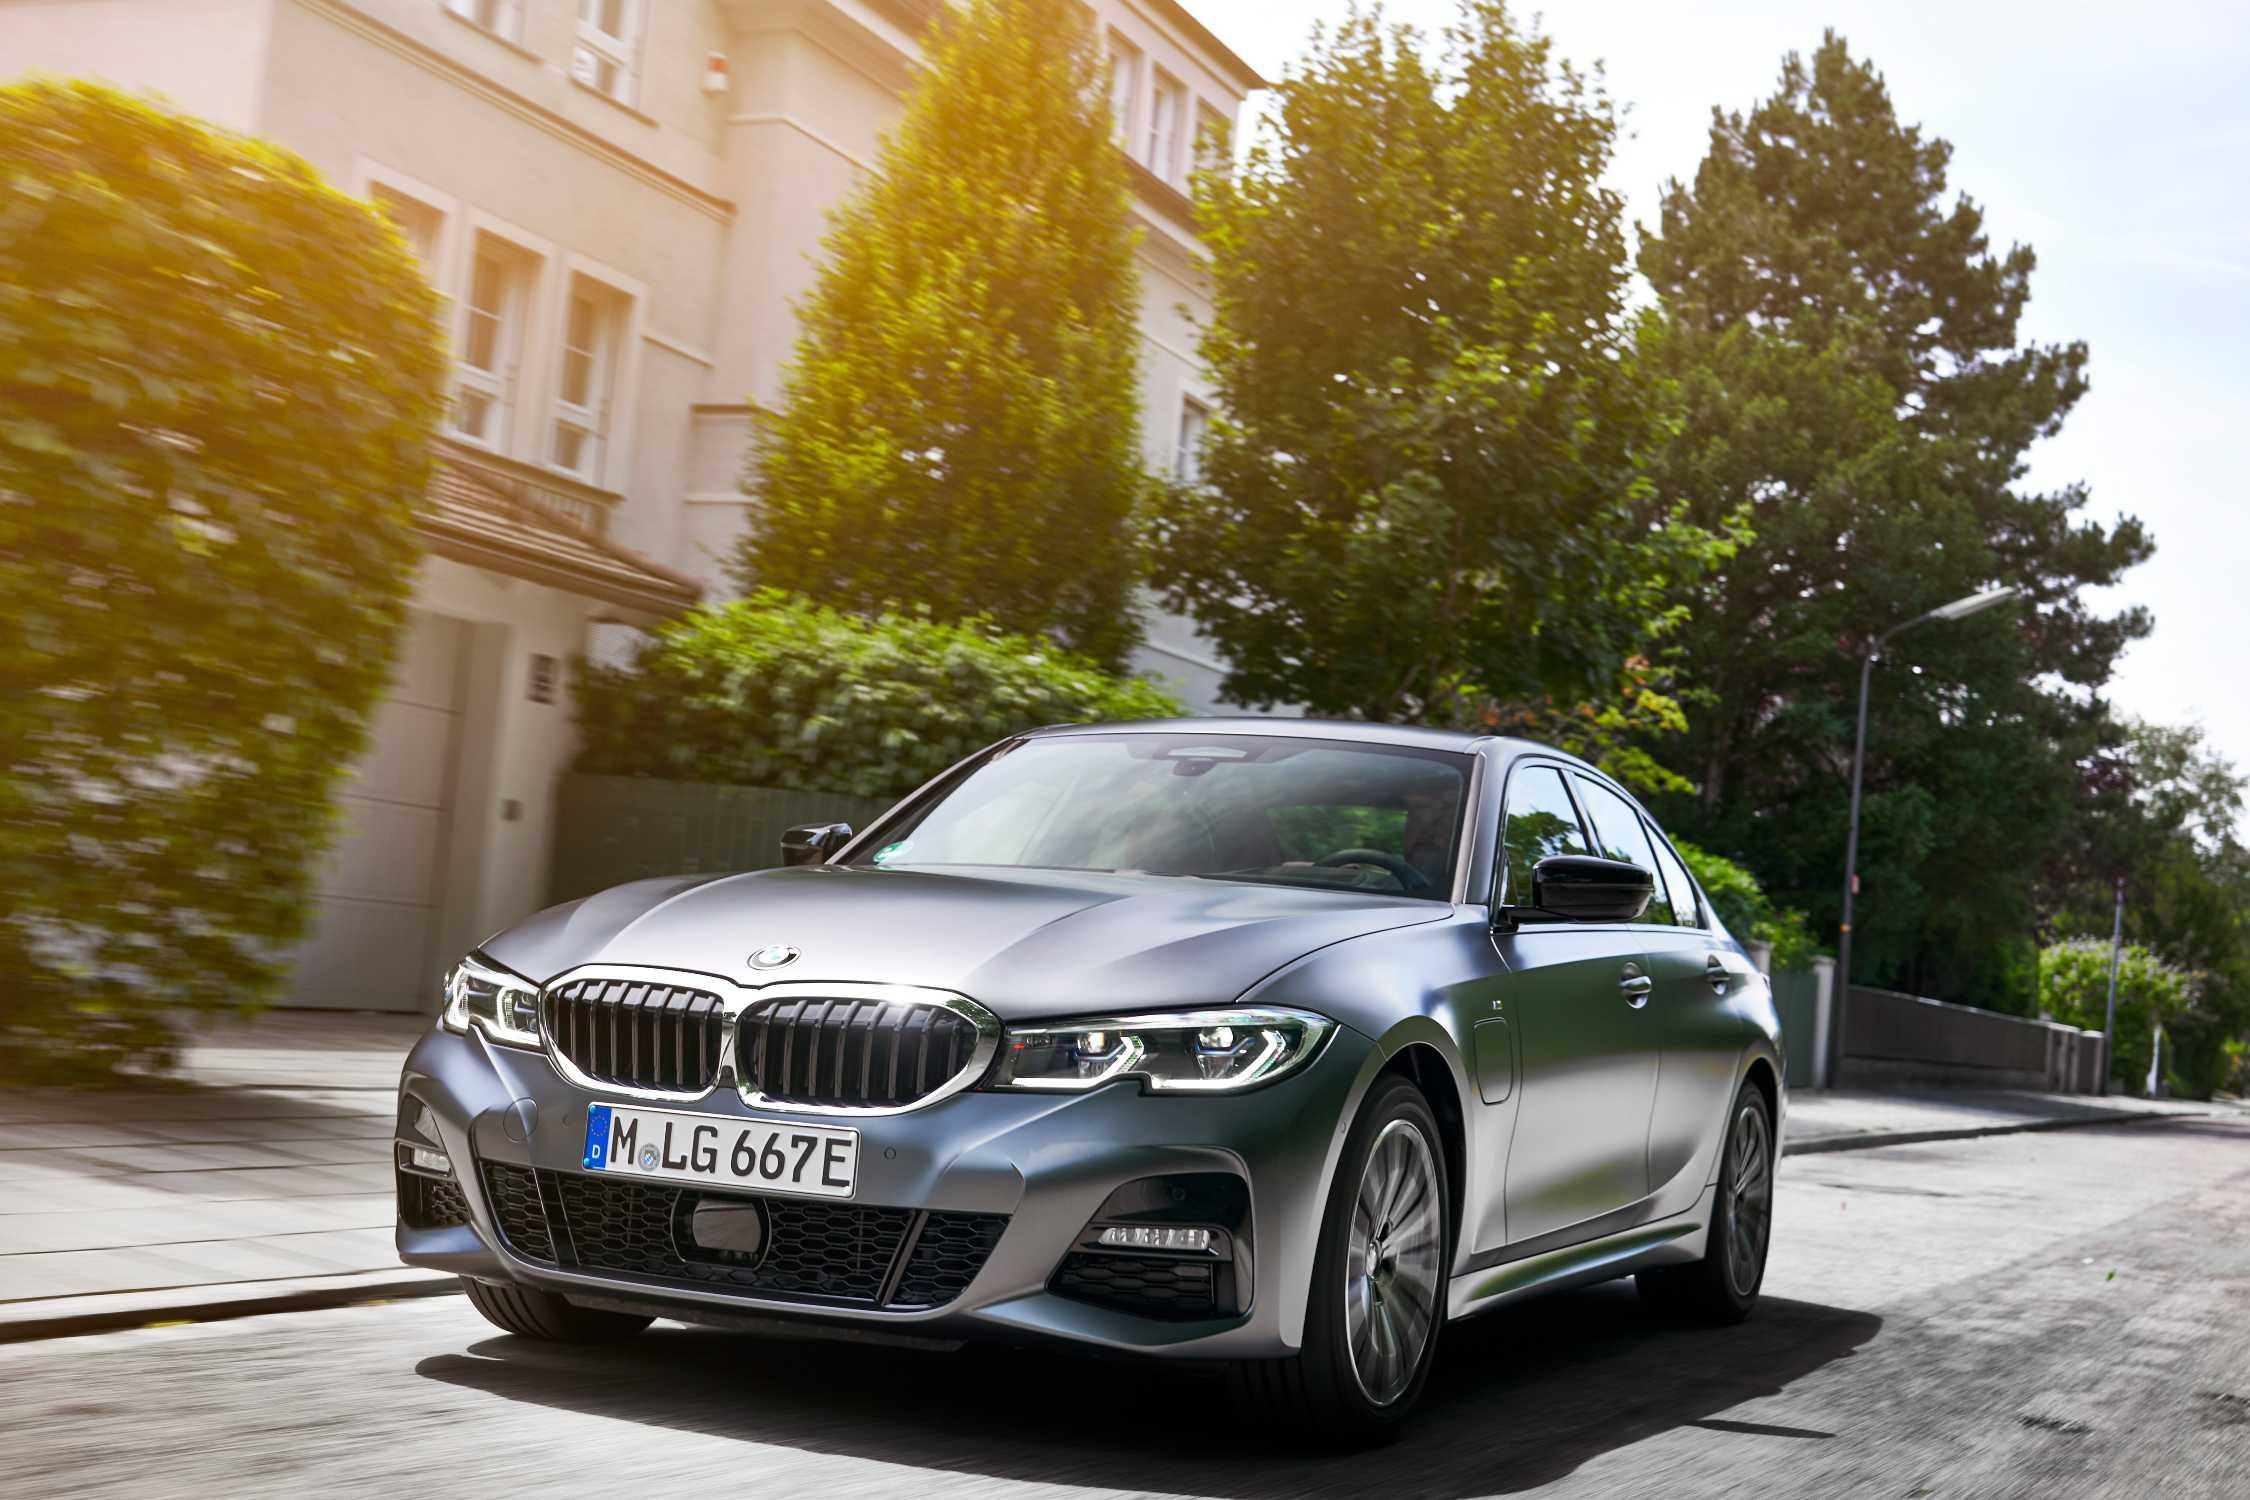 2020 BMW 3 Series Edrive Phev Interior